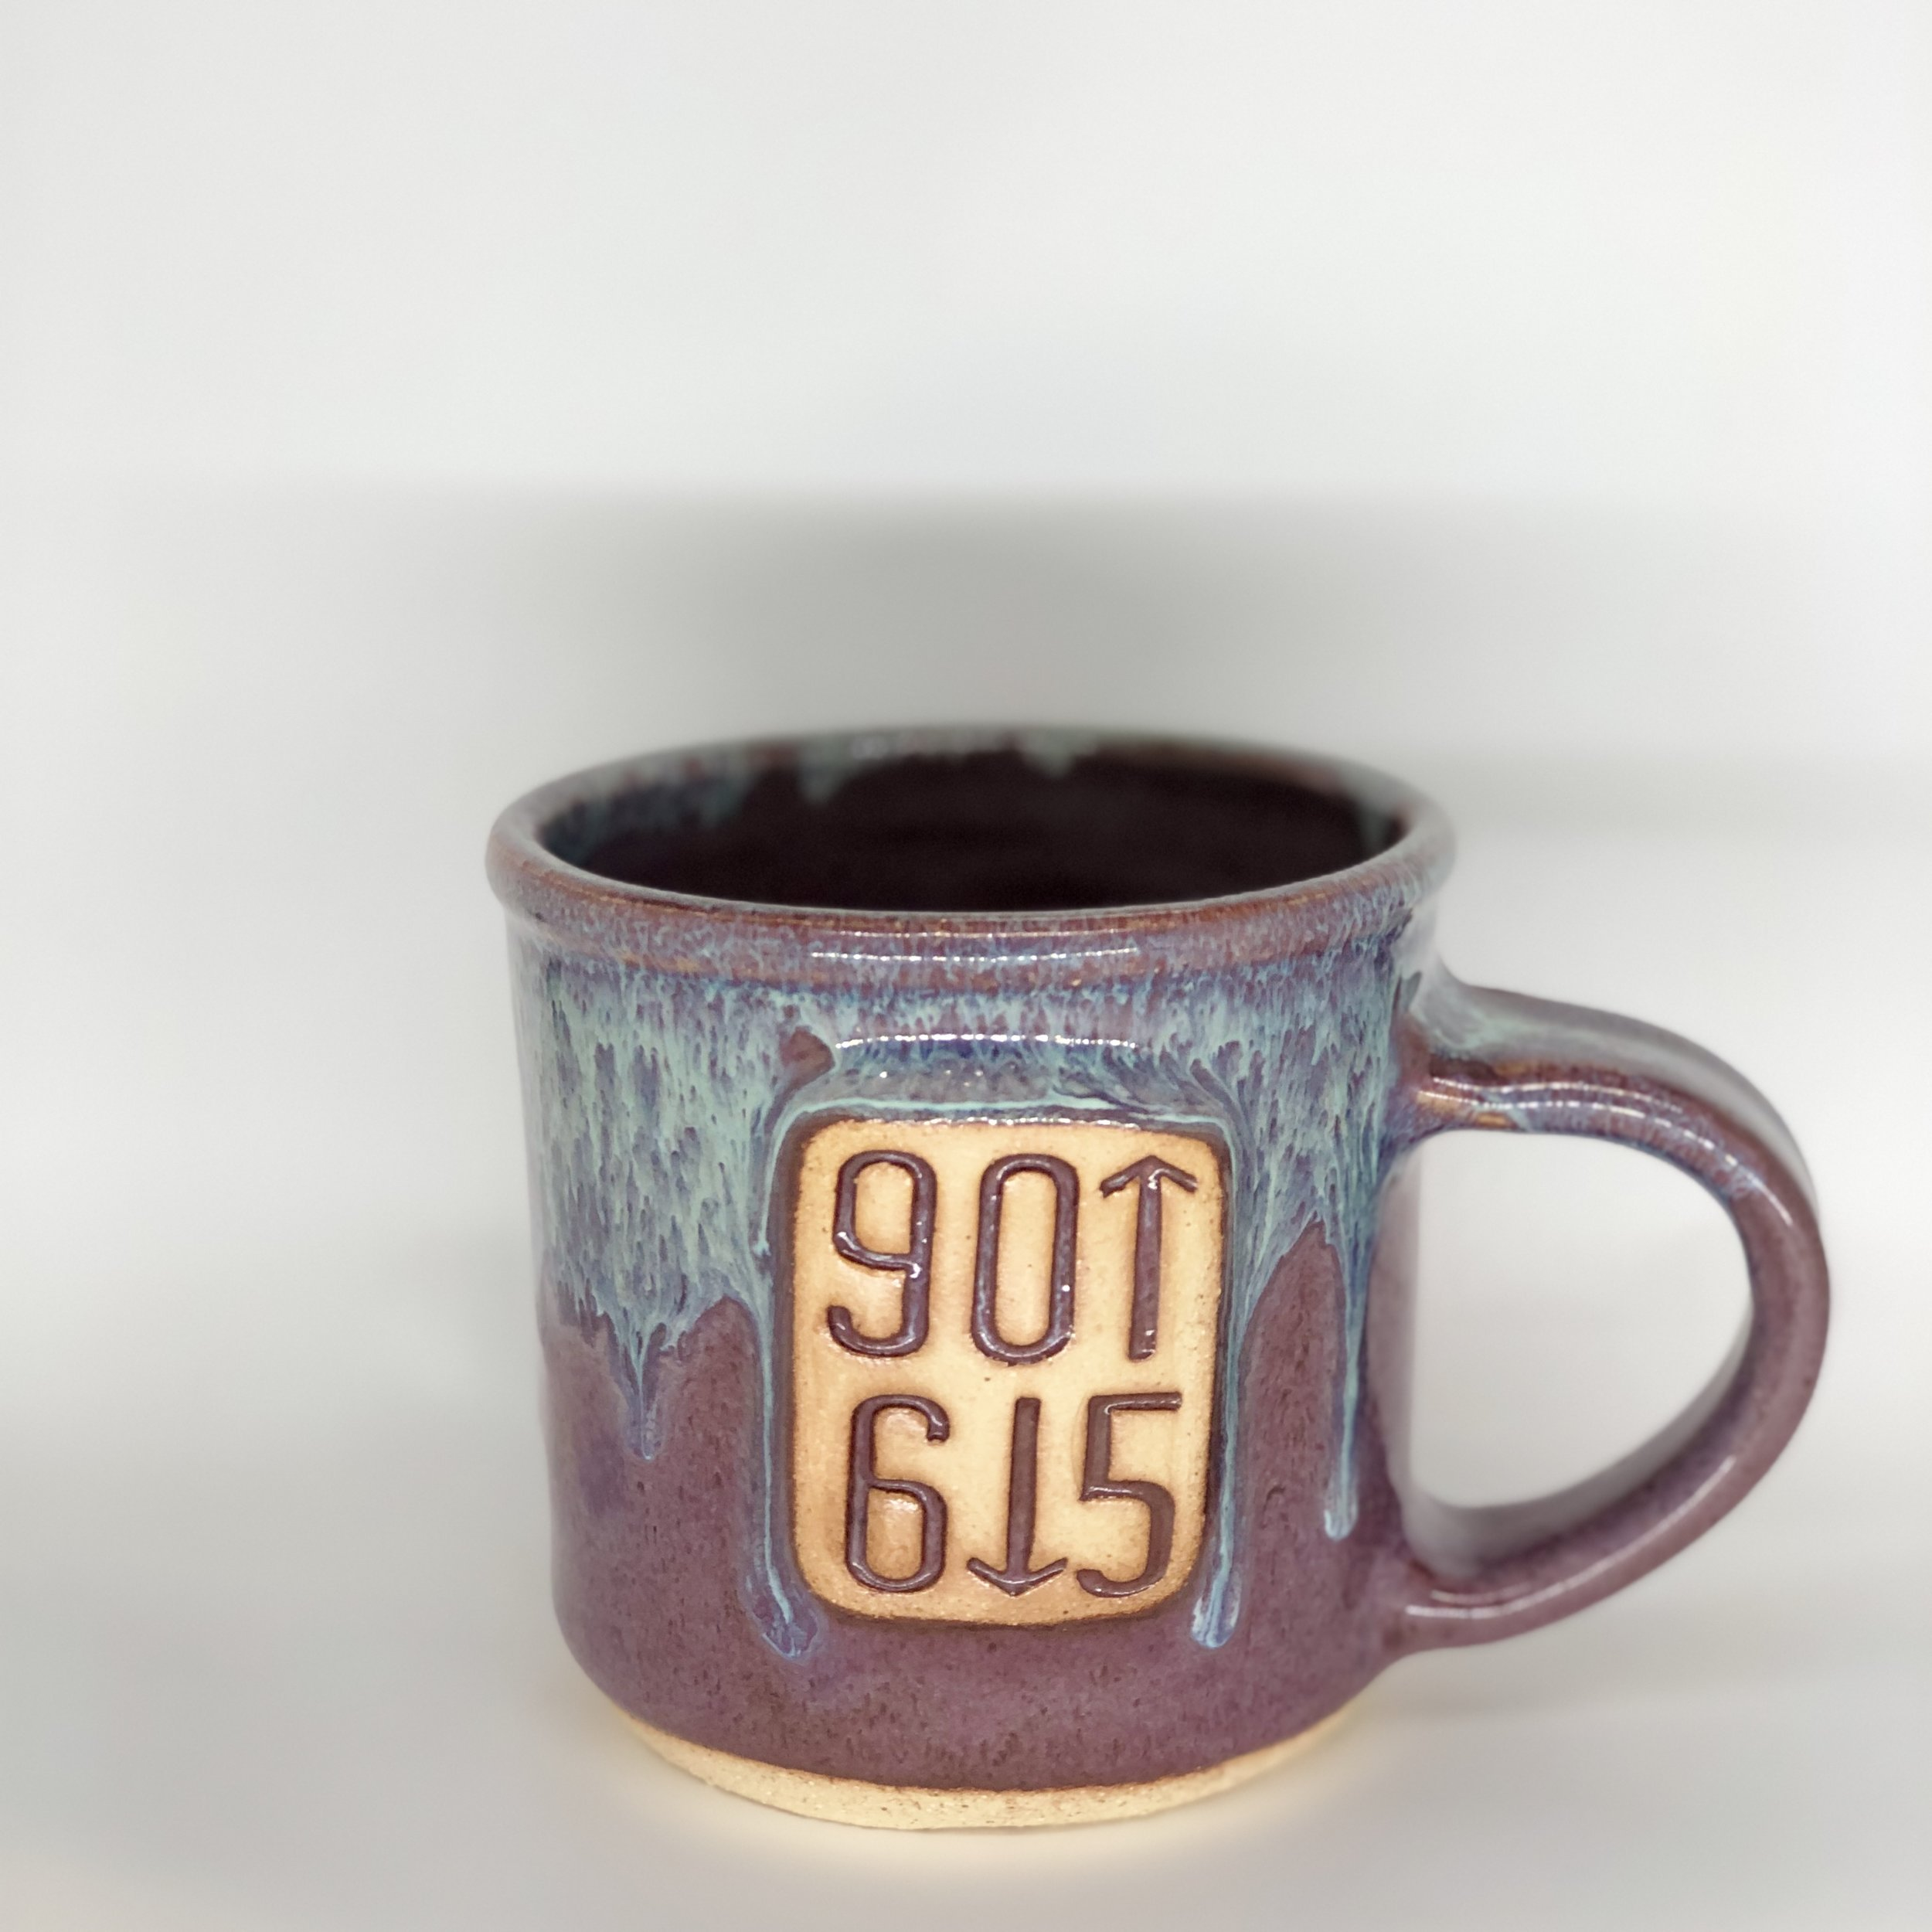 901 / 615 Mug, Short Mug, Blue / Purple Color